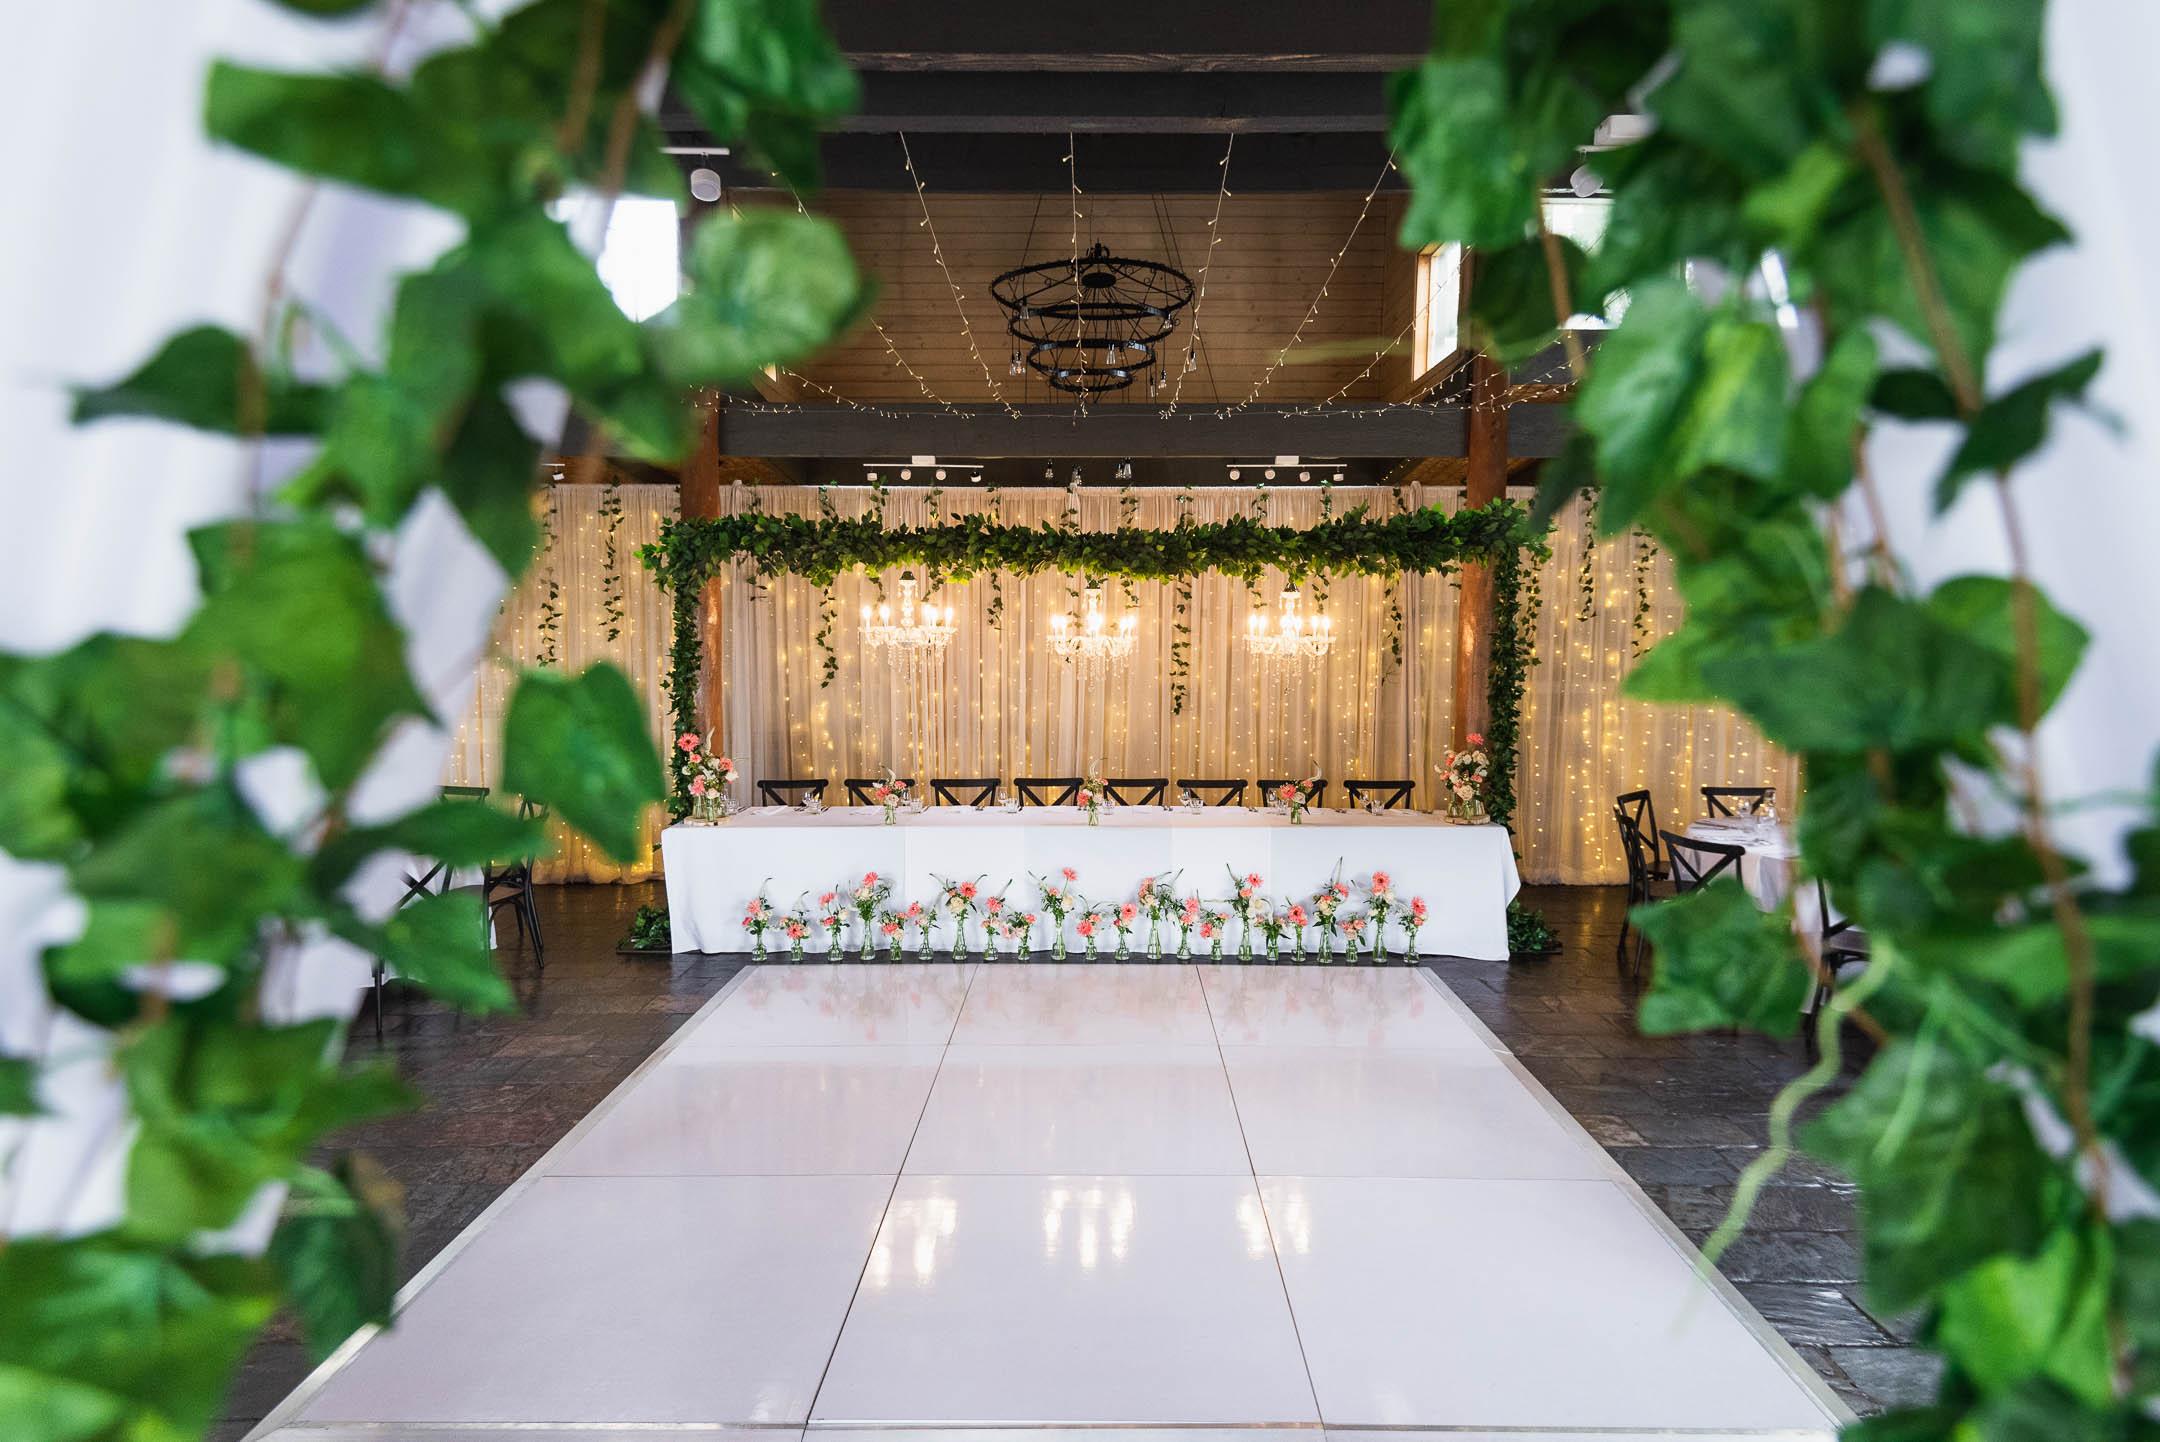 Fergusson winery bridal table setting